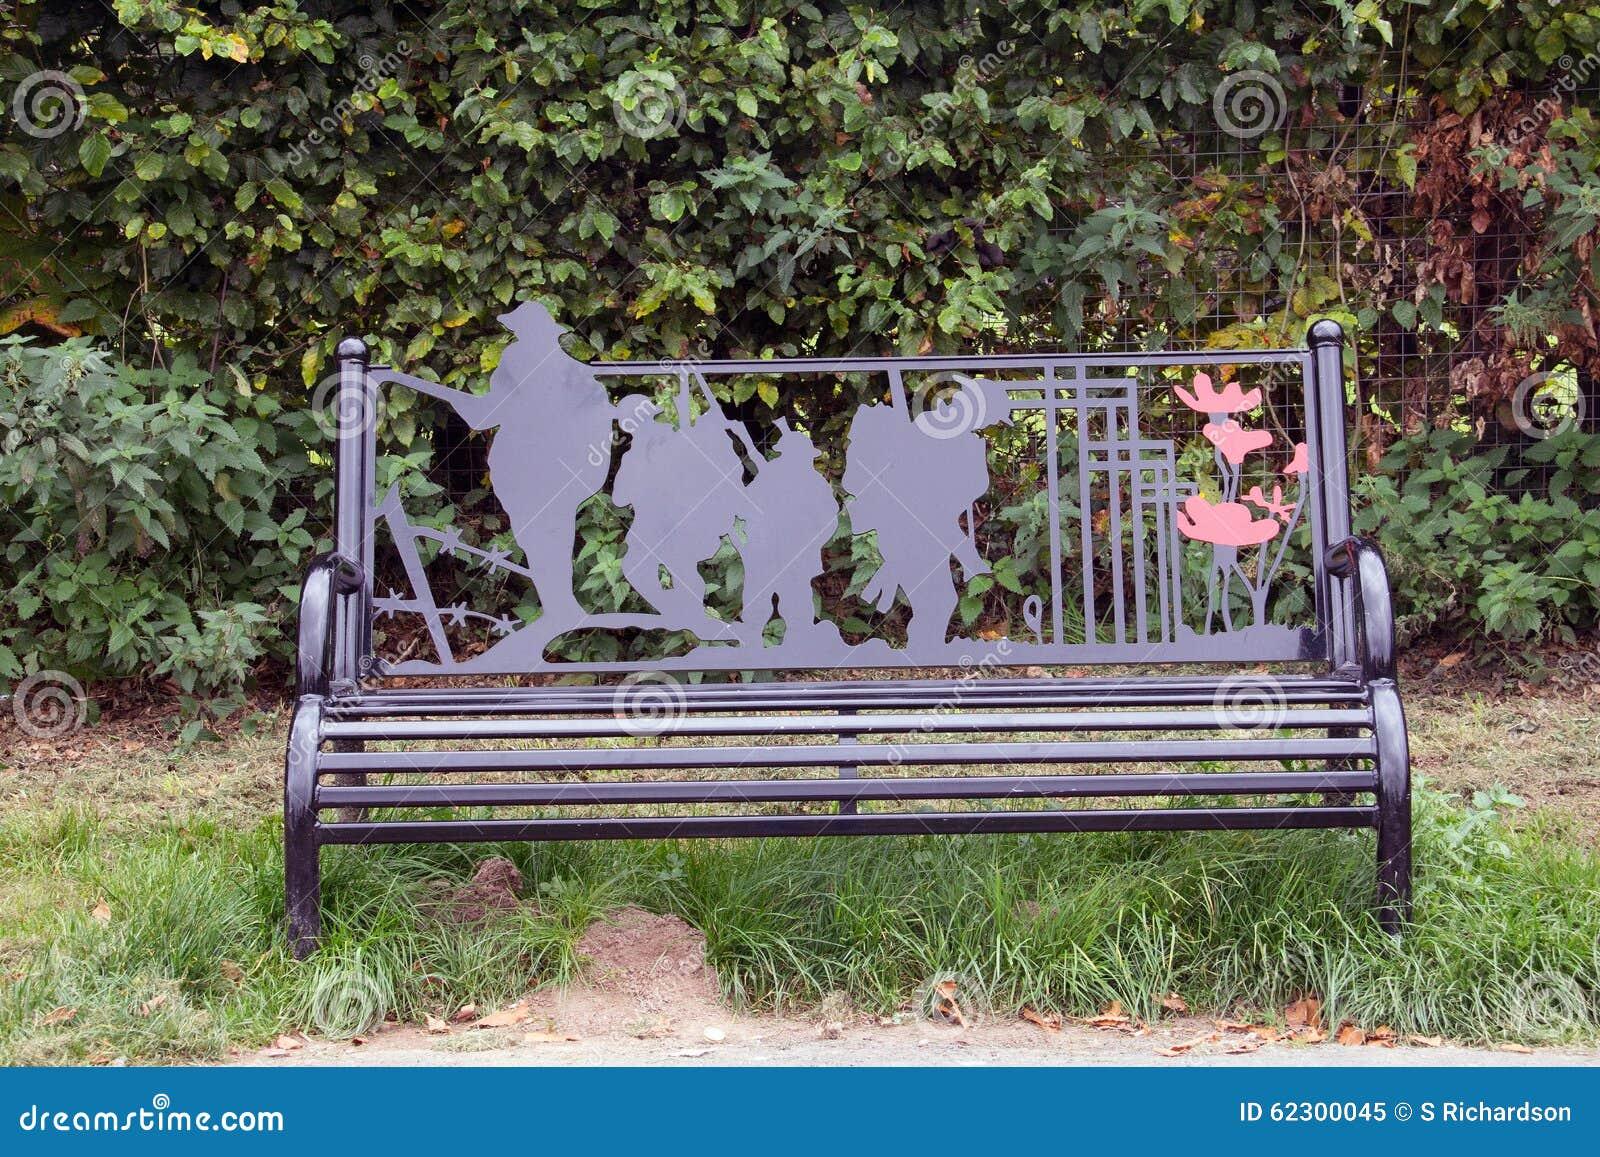 World War 1 Memorial Bench Stock Photo Image 62300045